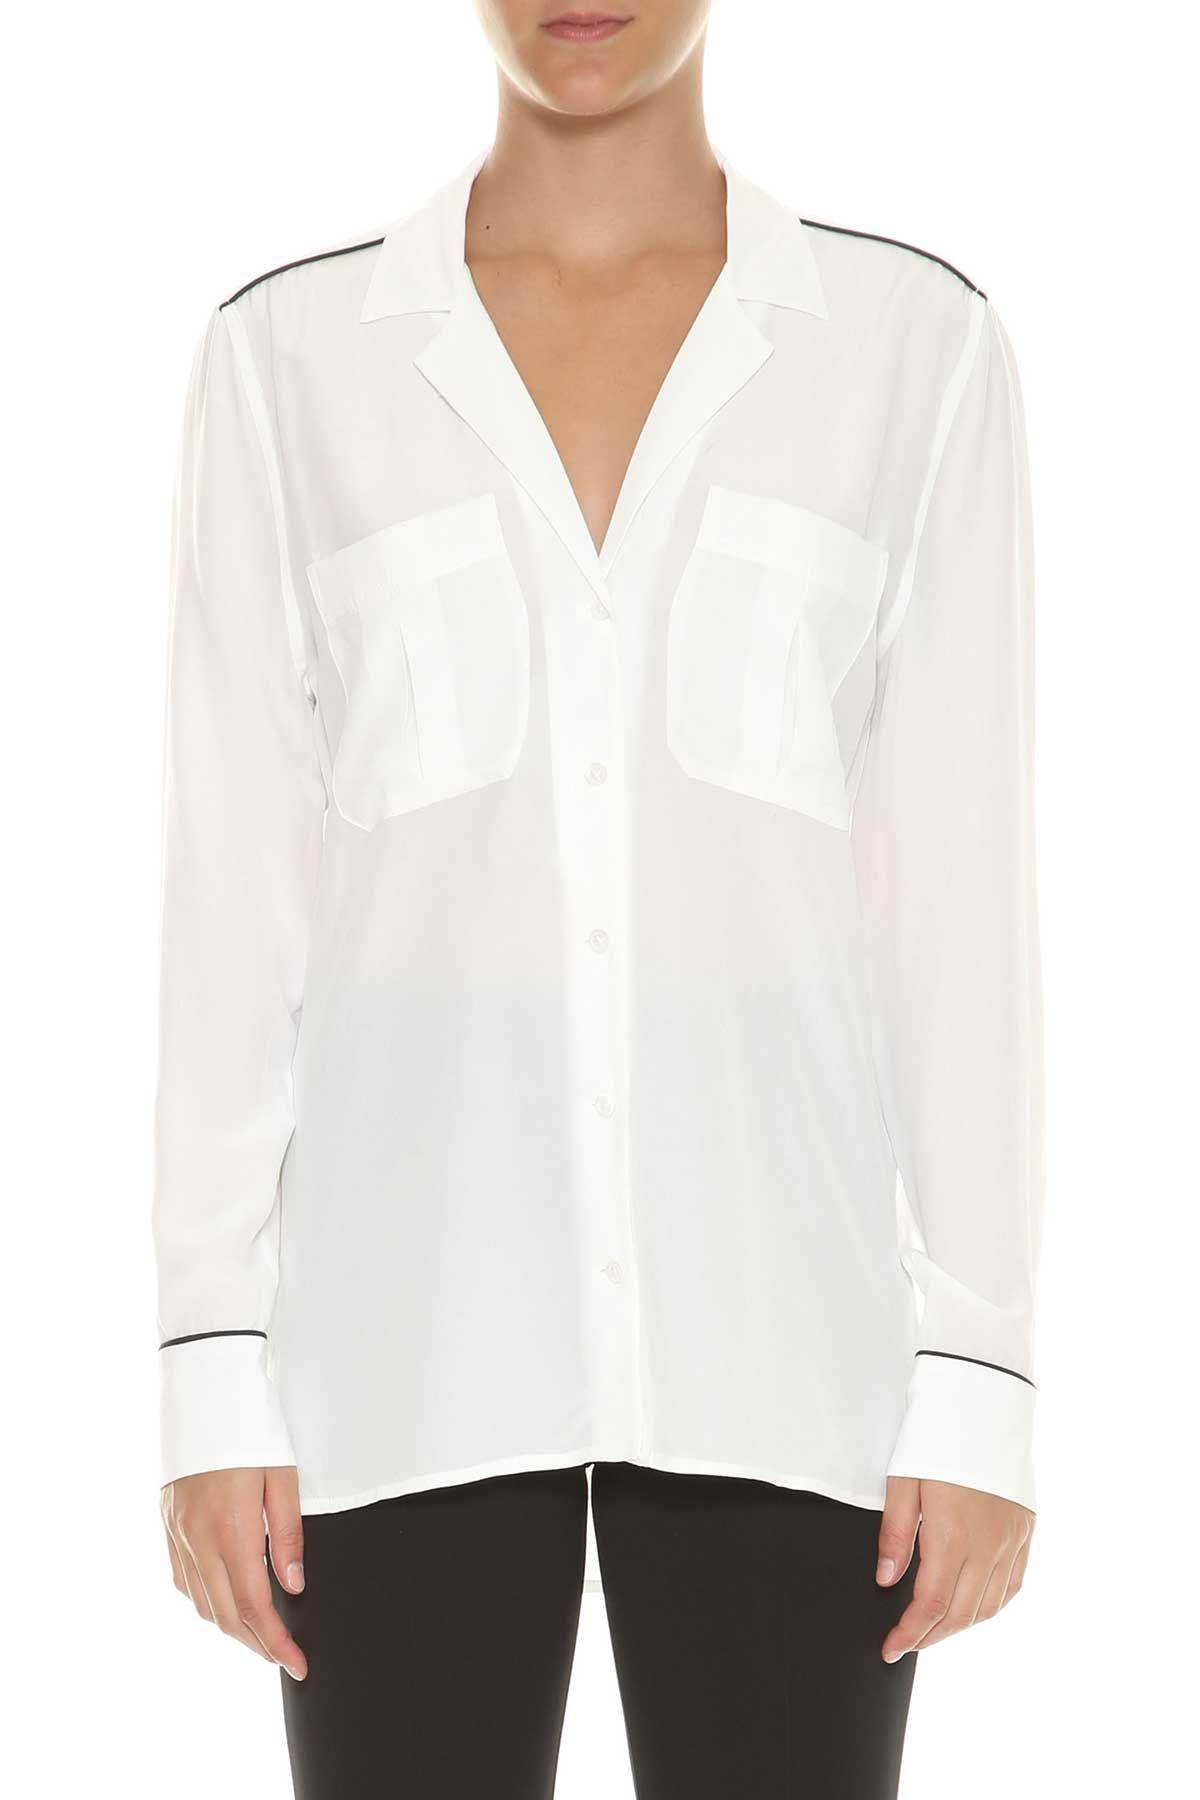 Equipment sonny Silk Pijama Shirt